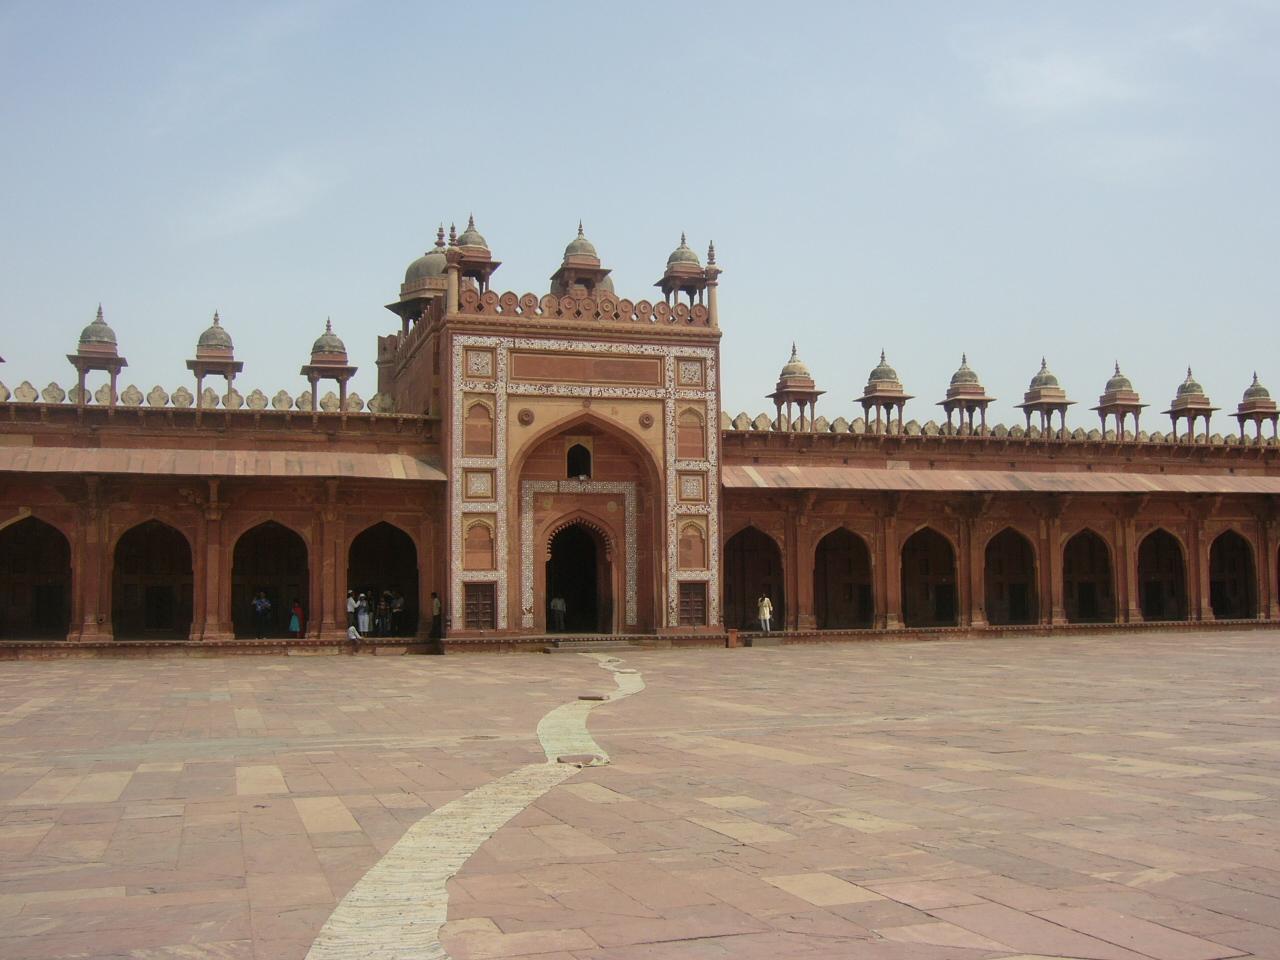 Agra India  city pictures gallery : Description Fatehpur Shikri Agra India 15